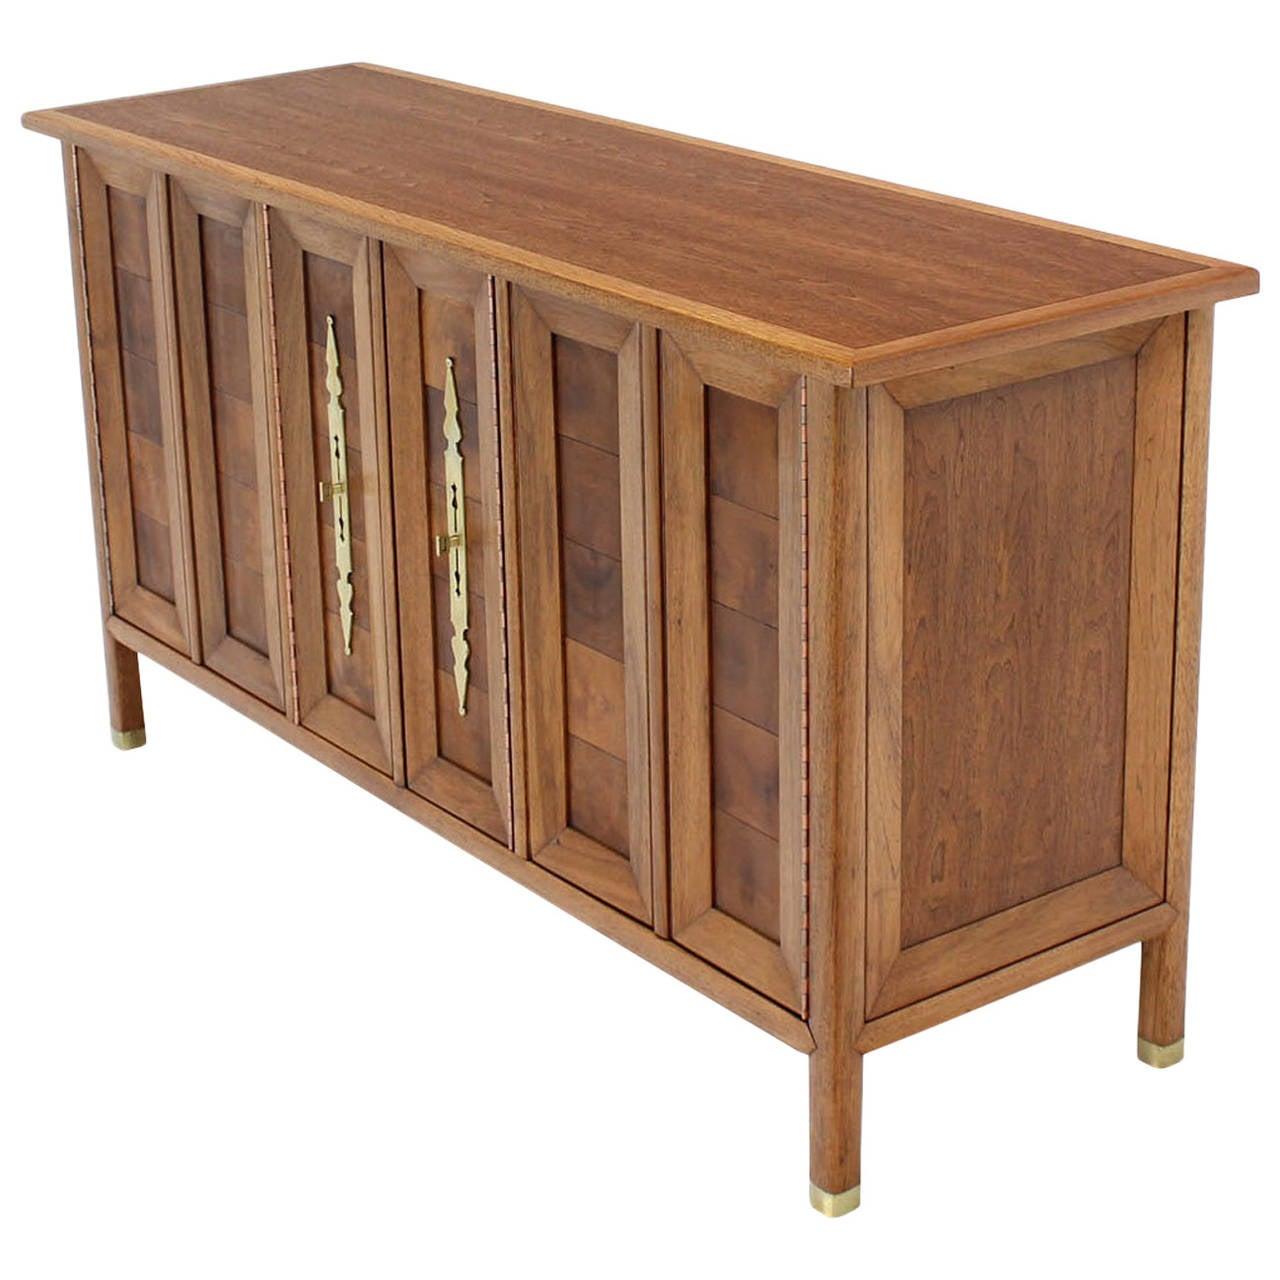 midcentury modern dresser credenza with folding doors brass hardware 1